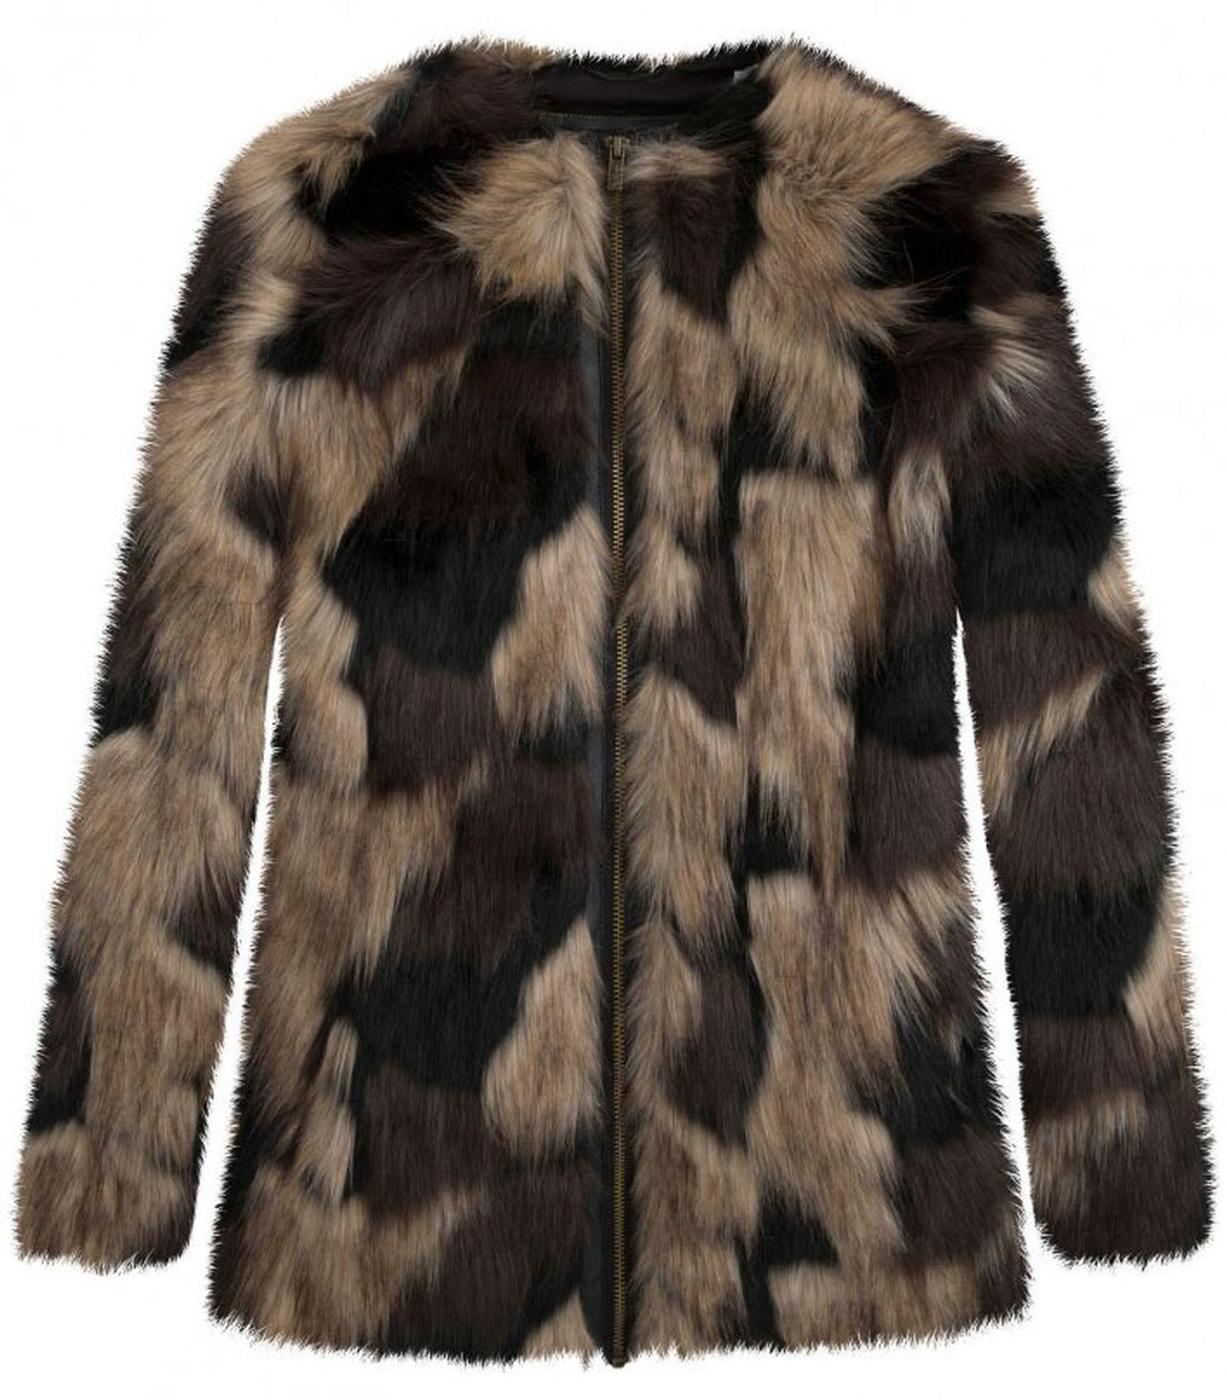 Broomfield PEPE JEANS Retro Vintage Faux Fur Coat